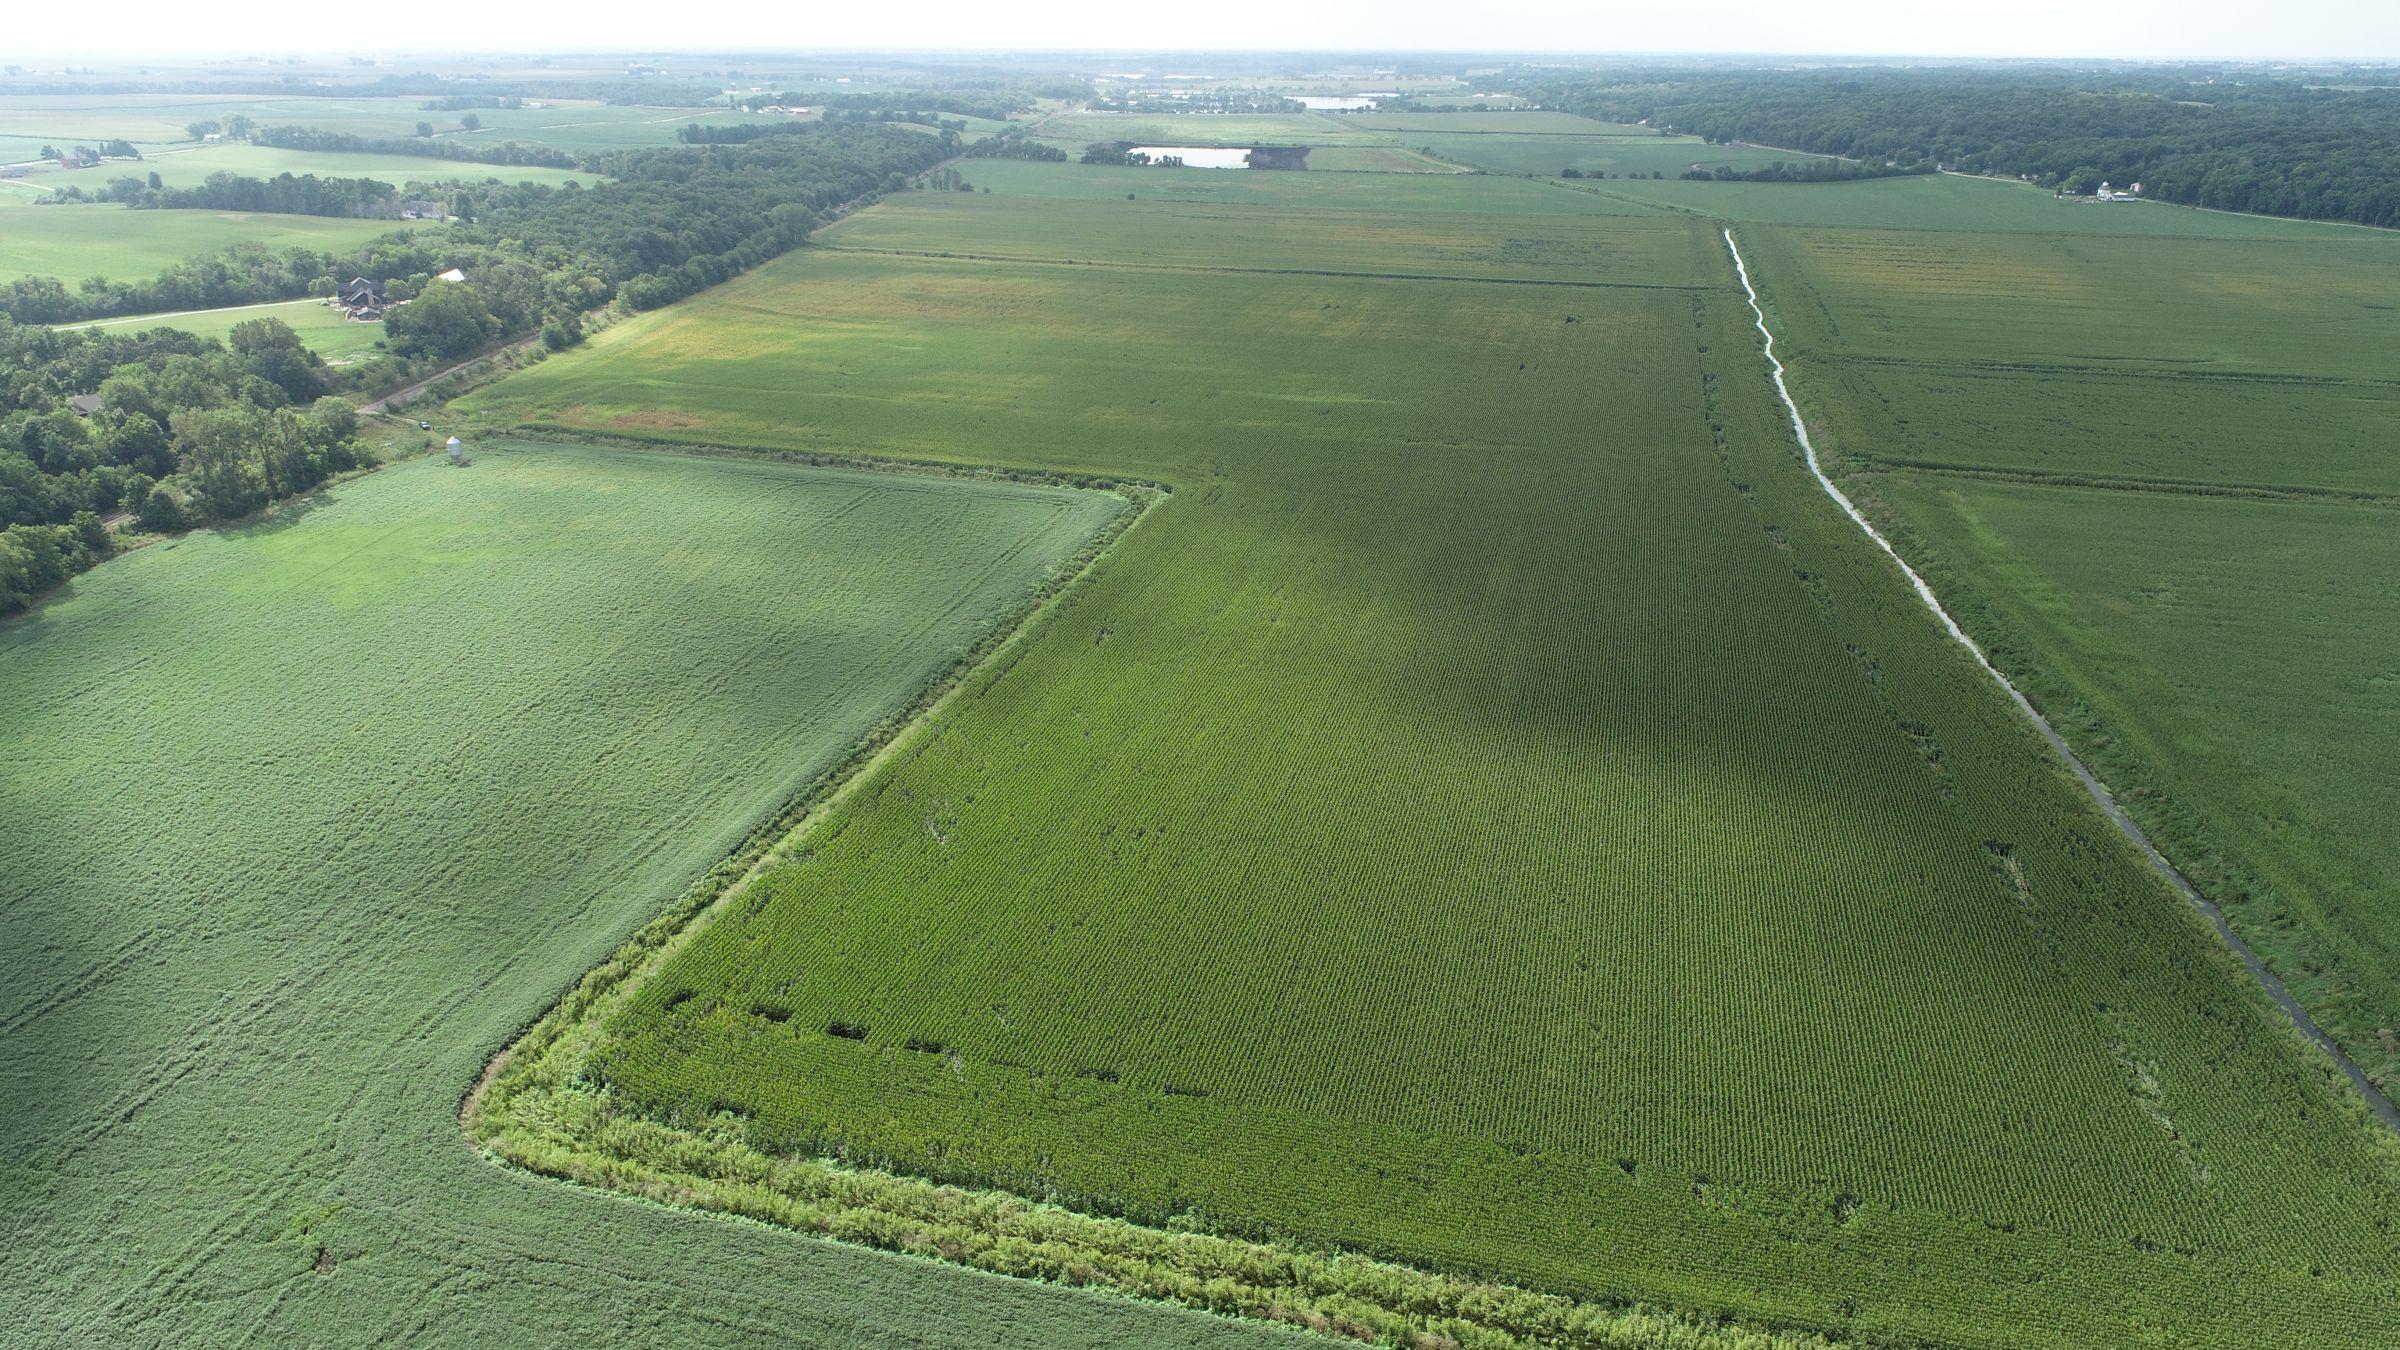 land-whiteside-county-illinois-146-acres-listing-number-15705-2-2021-08-27-180500.JPG